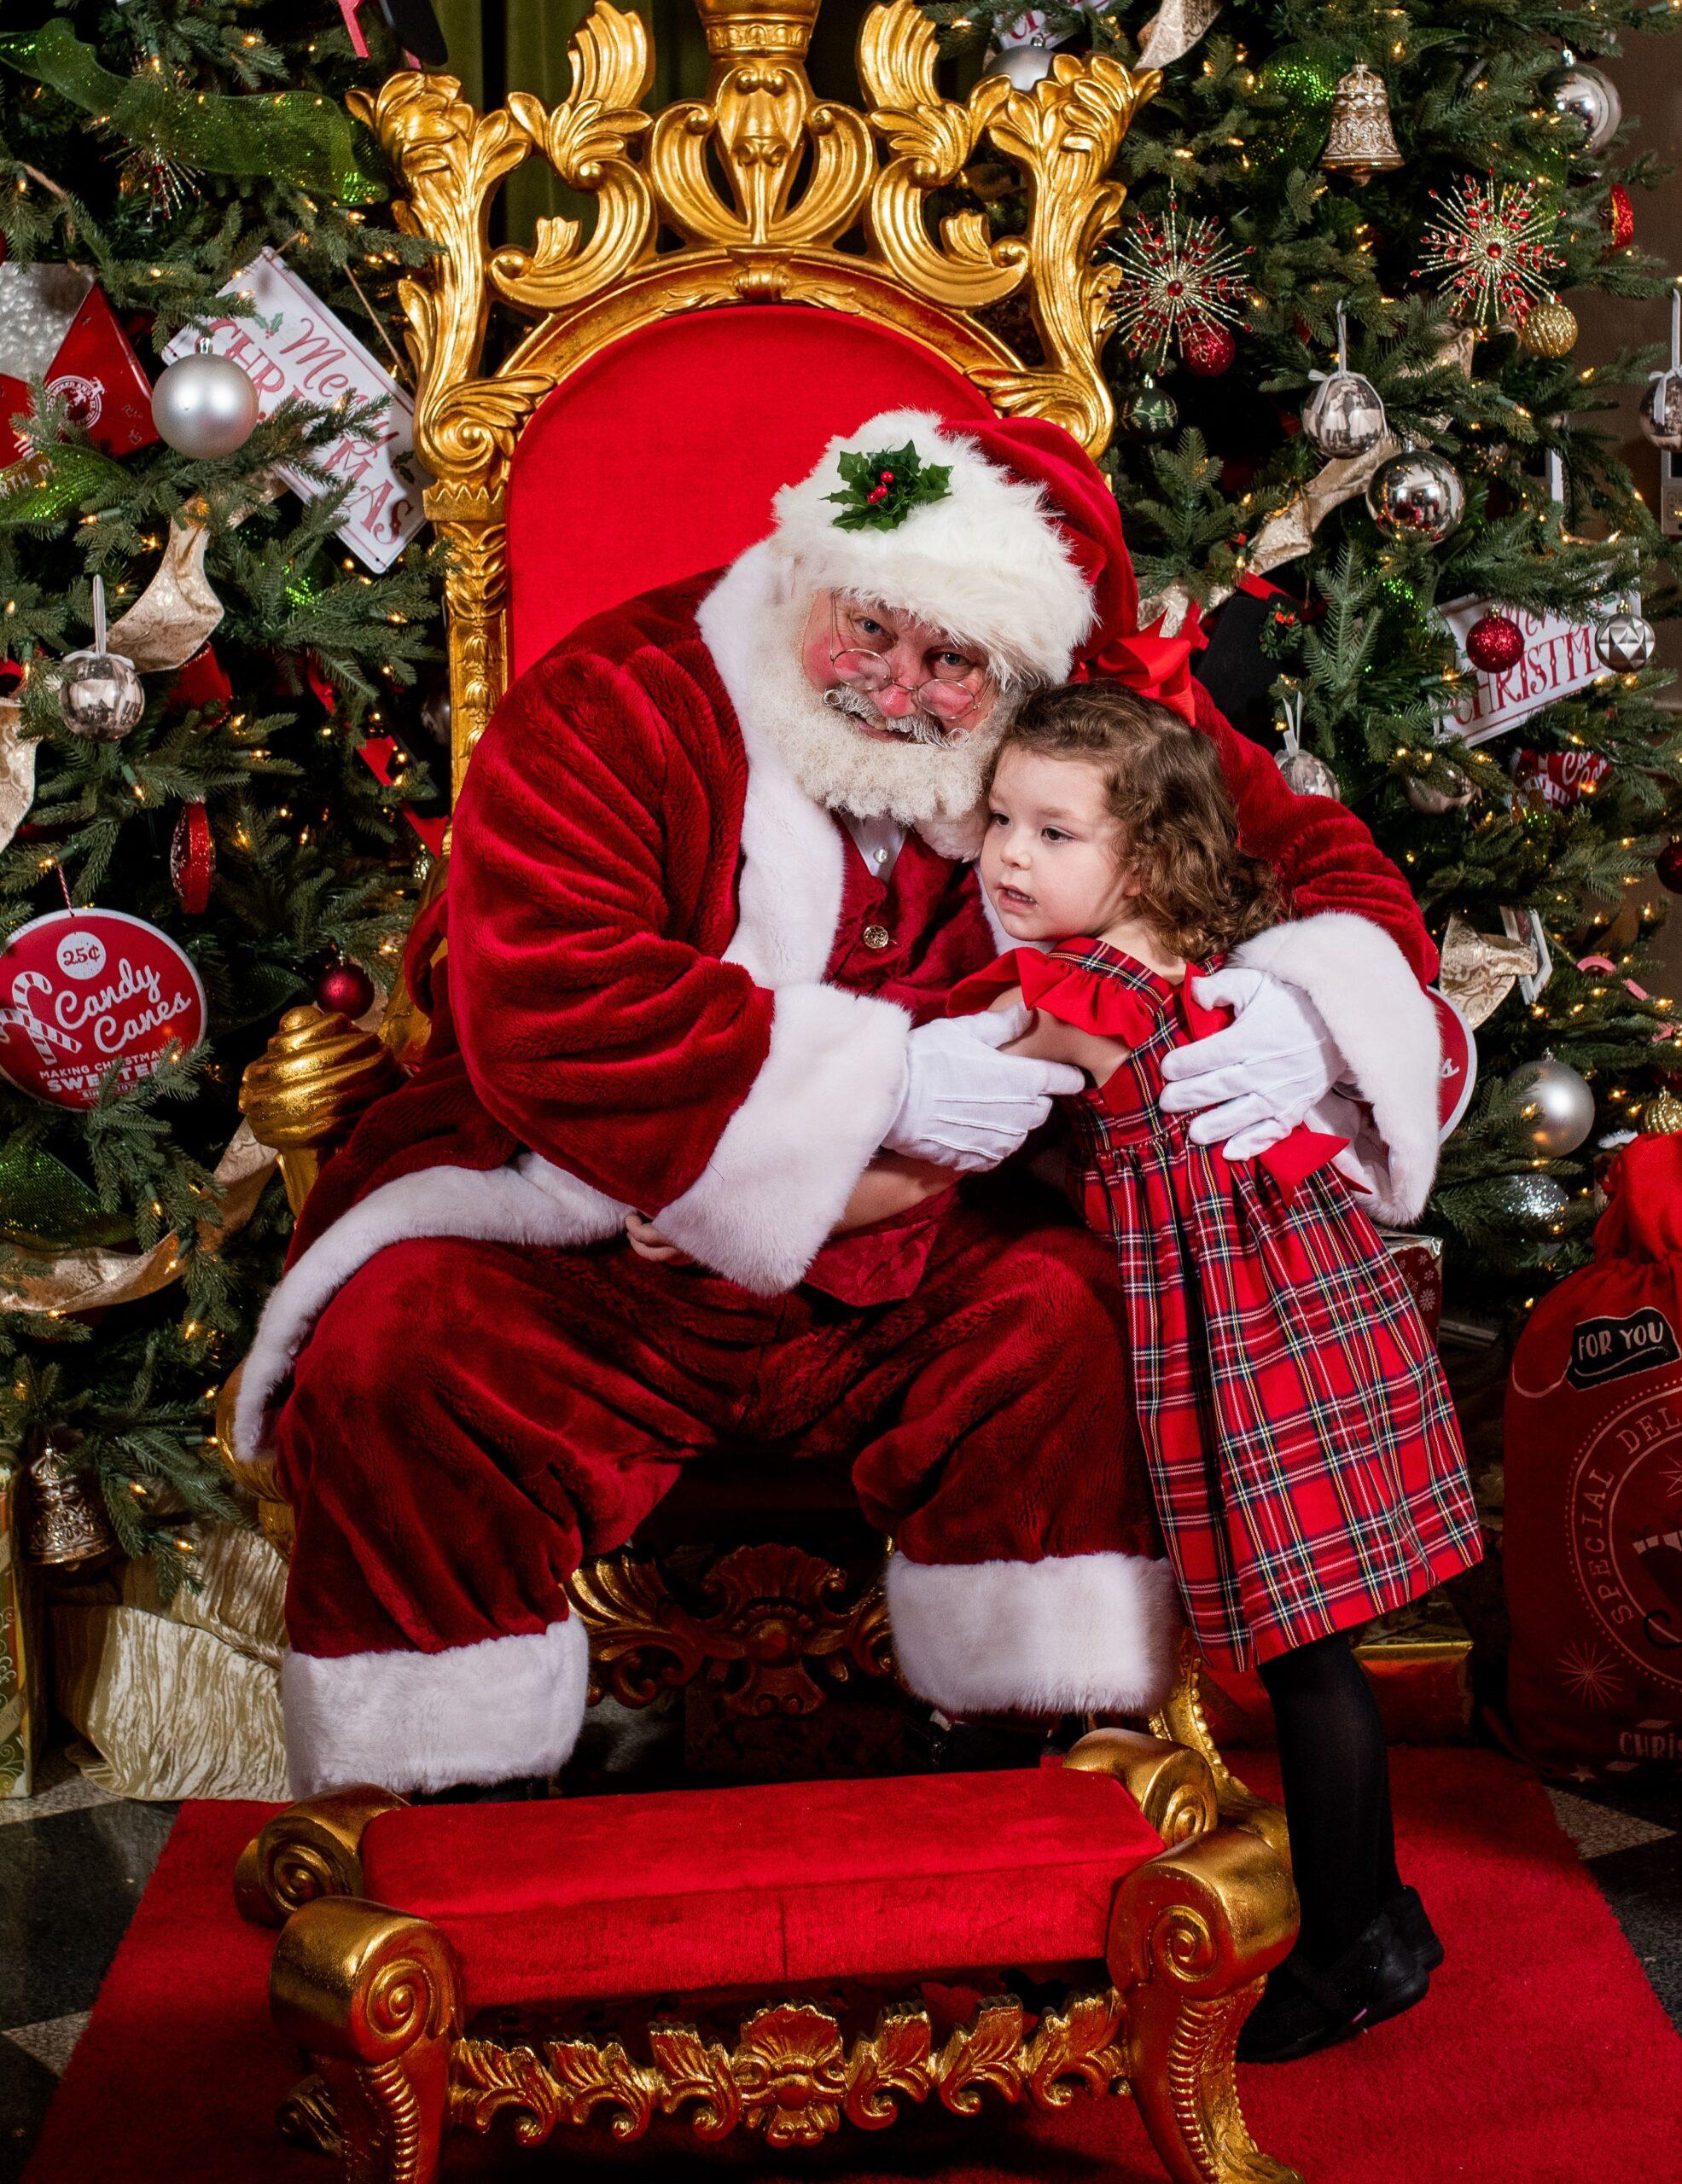 Santa Earl and more hugs